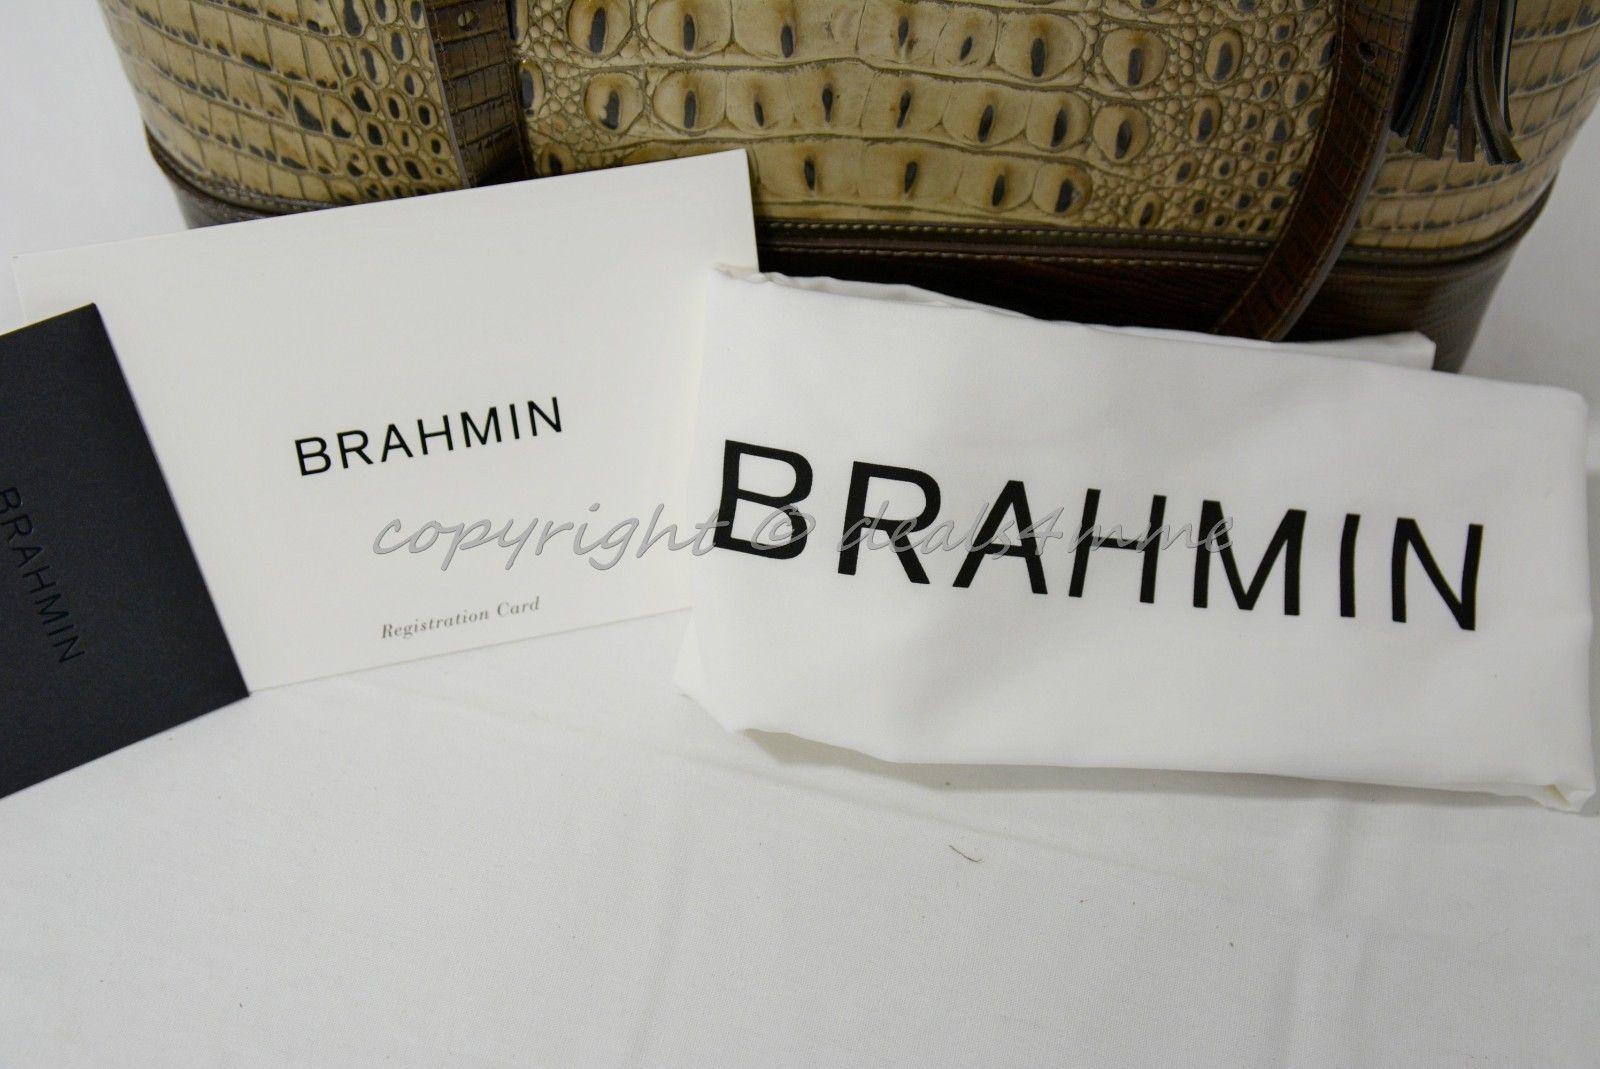 NWT Brahmin Medium Asher Leather Tote/Shoulder Bag Barley Bronte - Beige Brown image 8